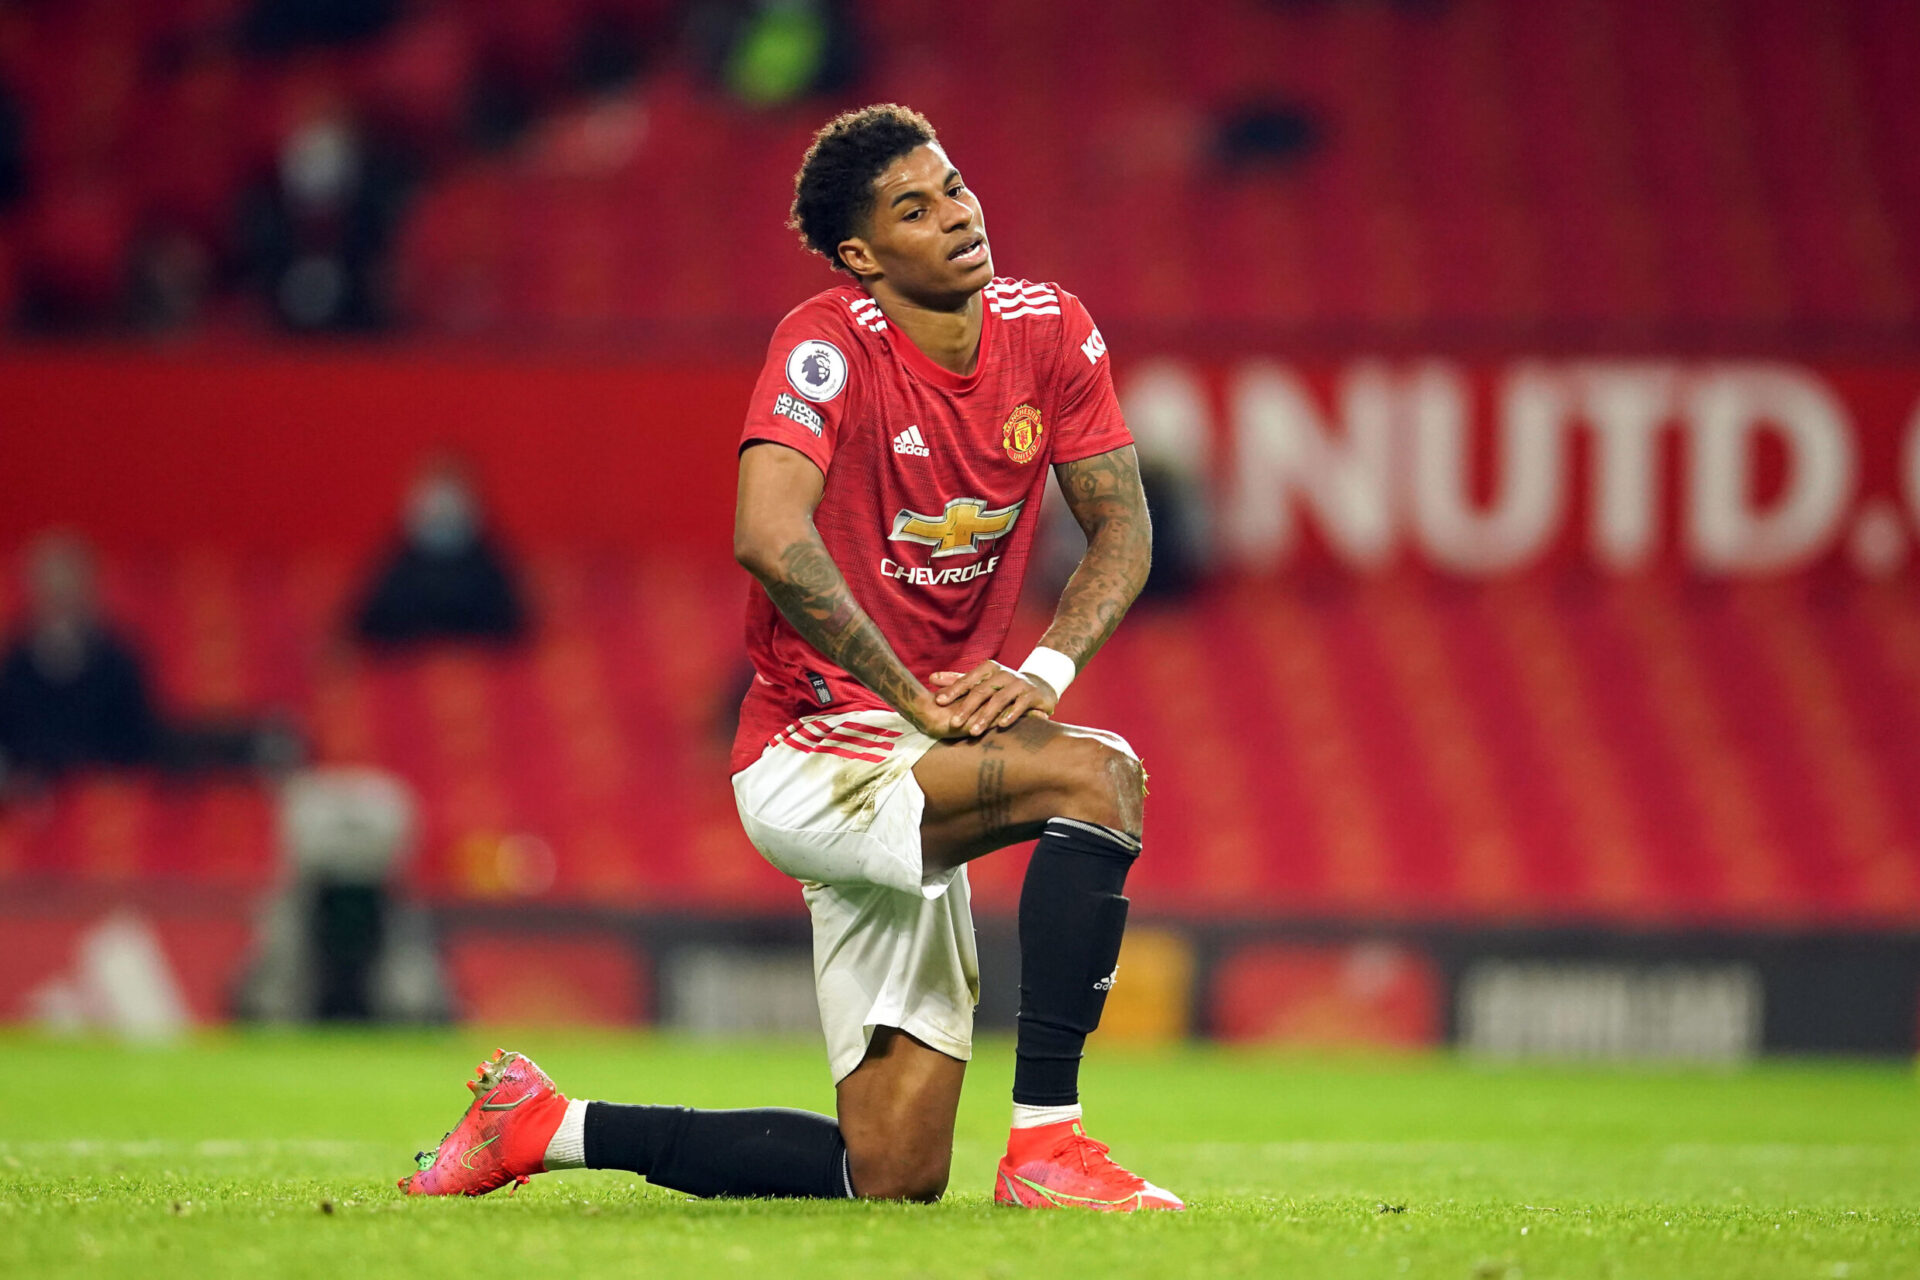 Marcus Rashford portant le maillot de Manchester United (Icon Sport)